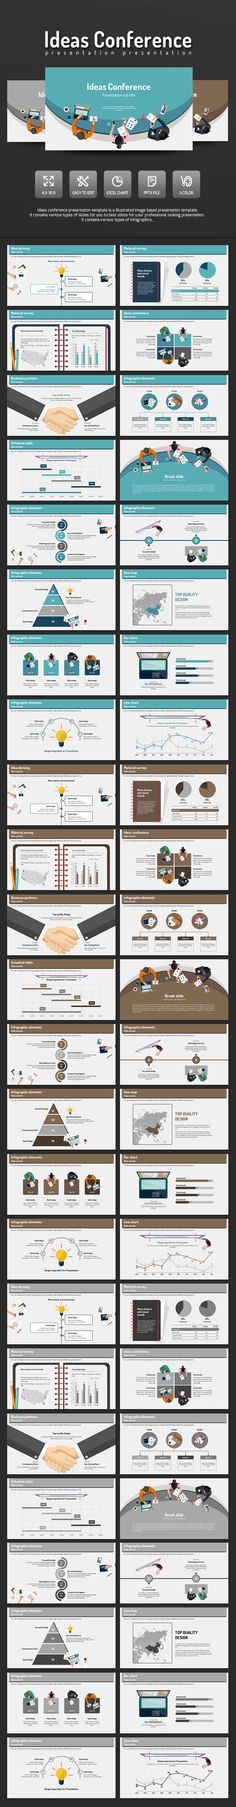 Powerpoint presentation ideas